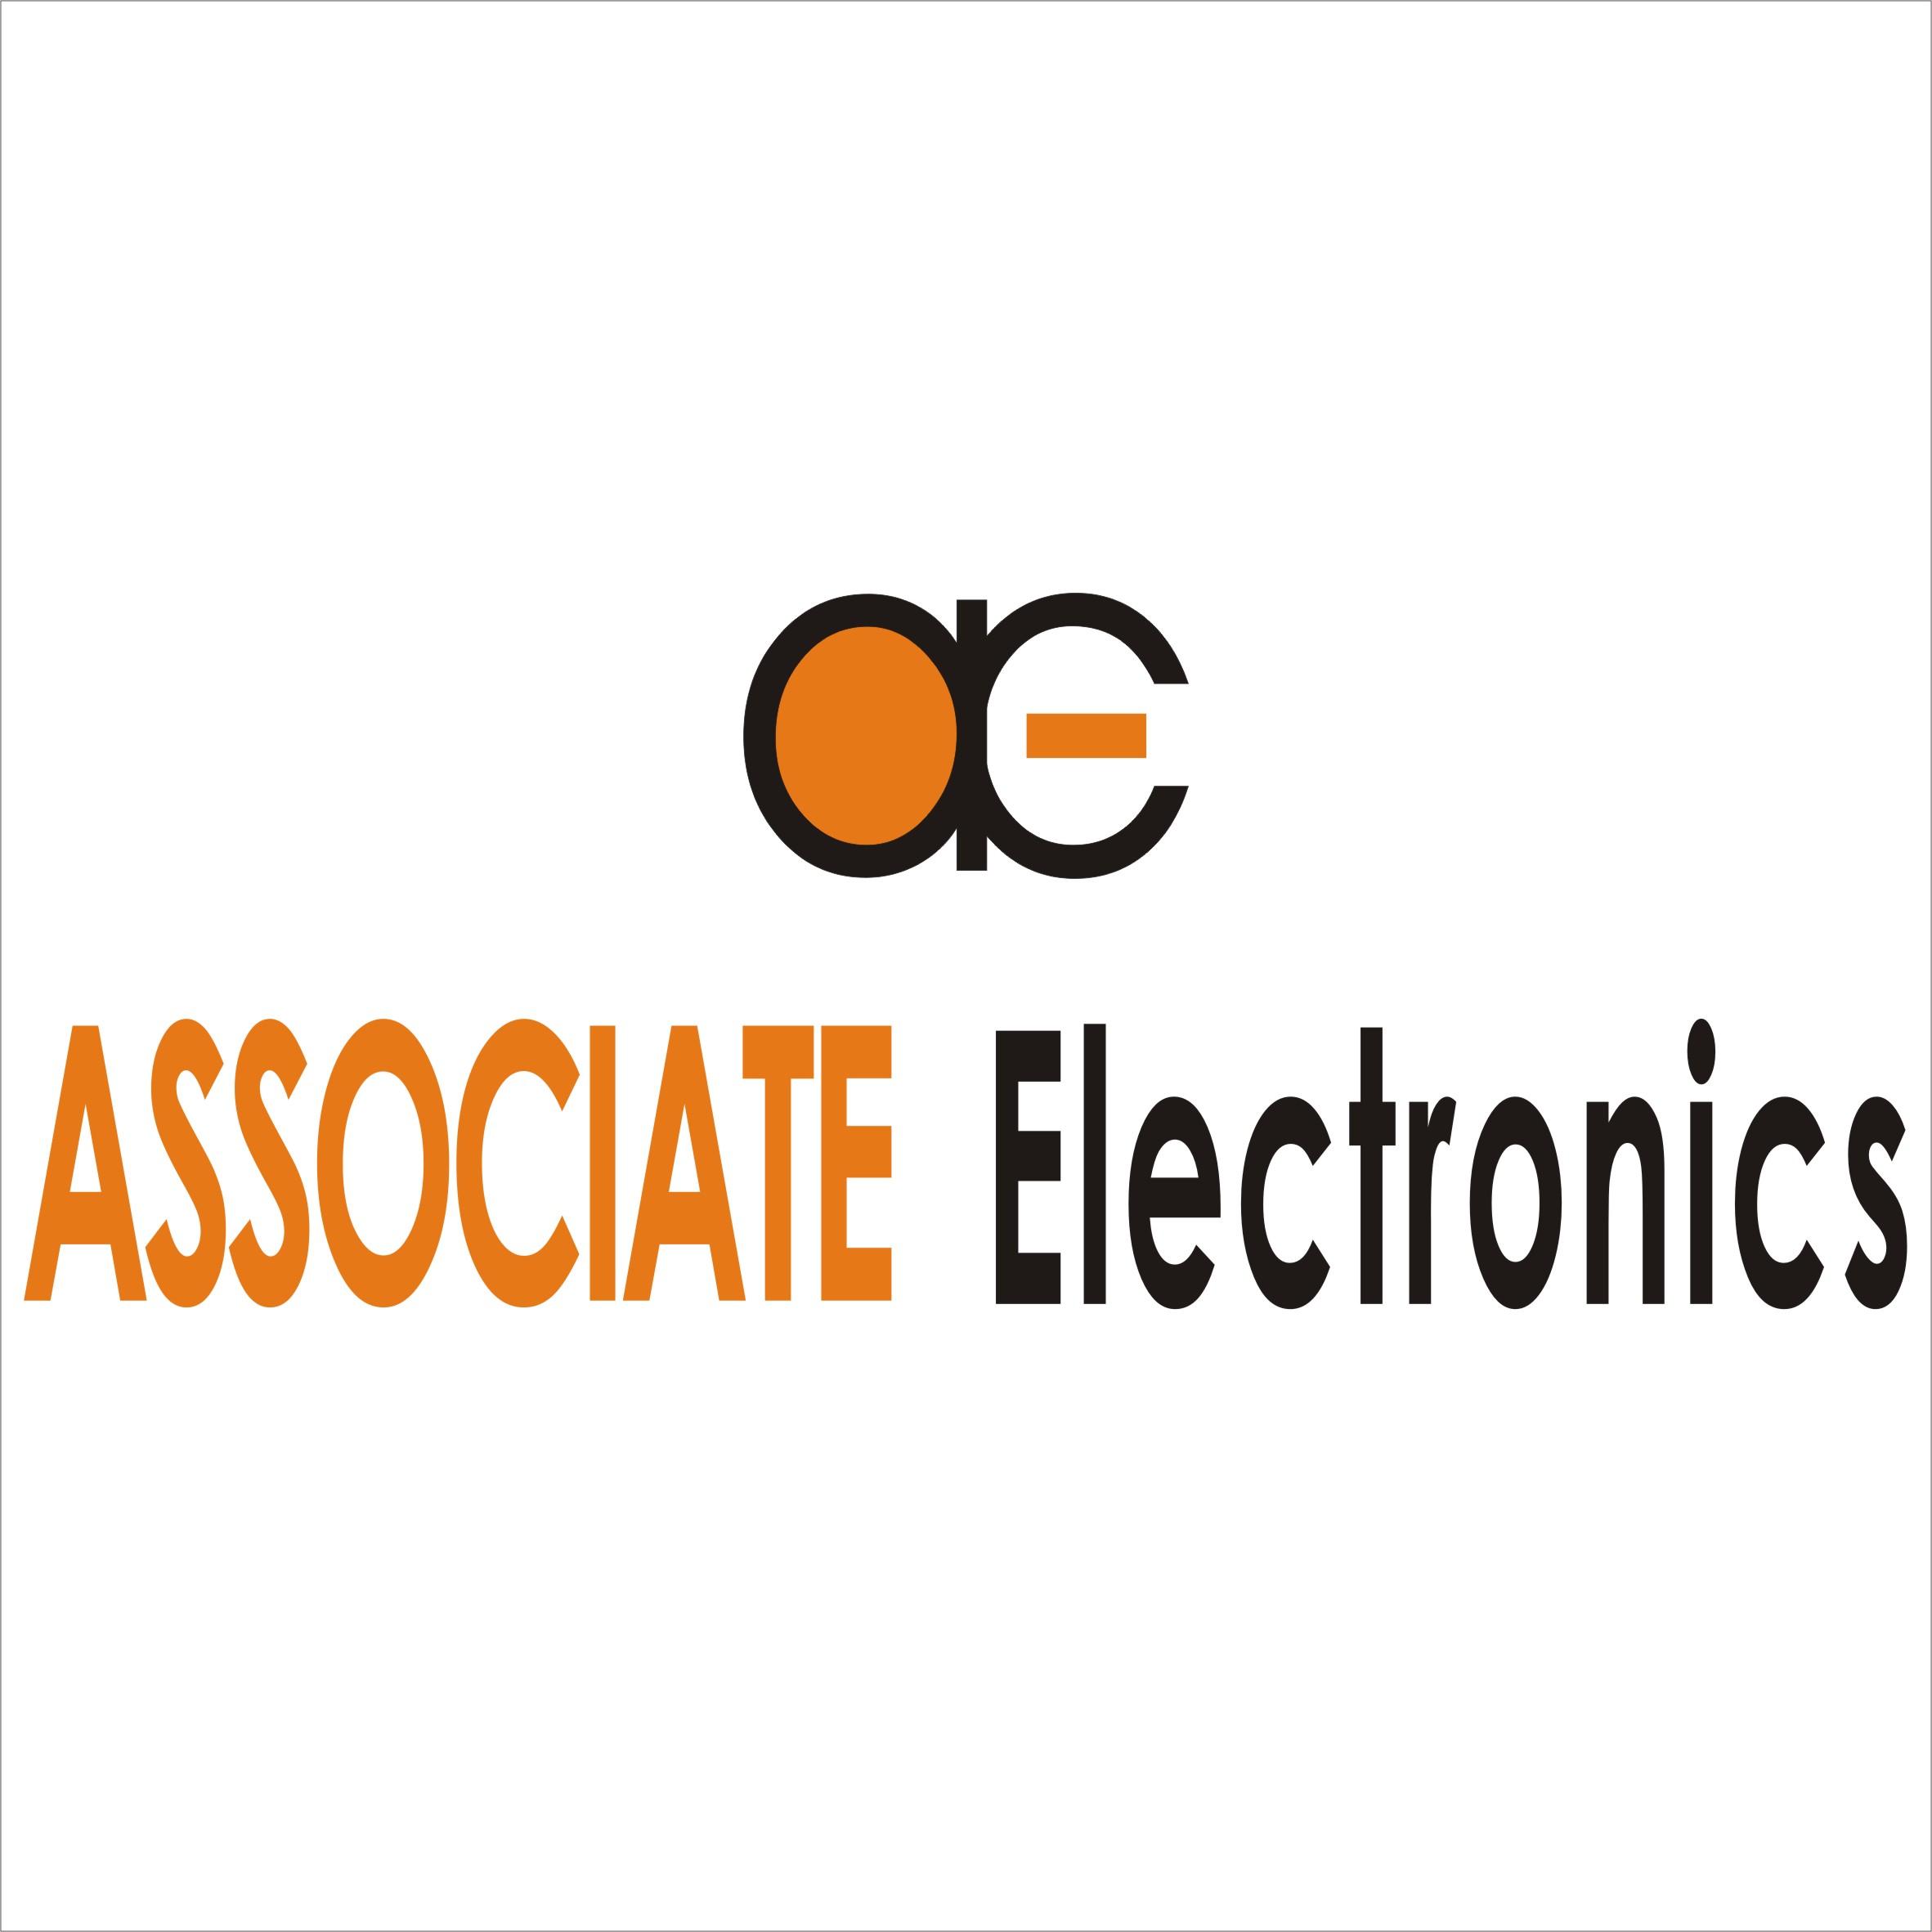 Associate Electronics - logo